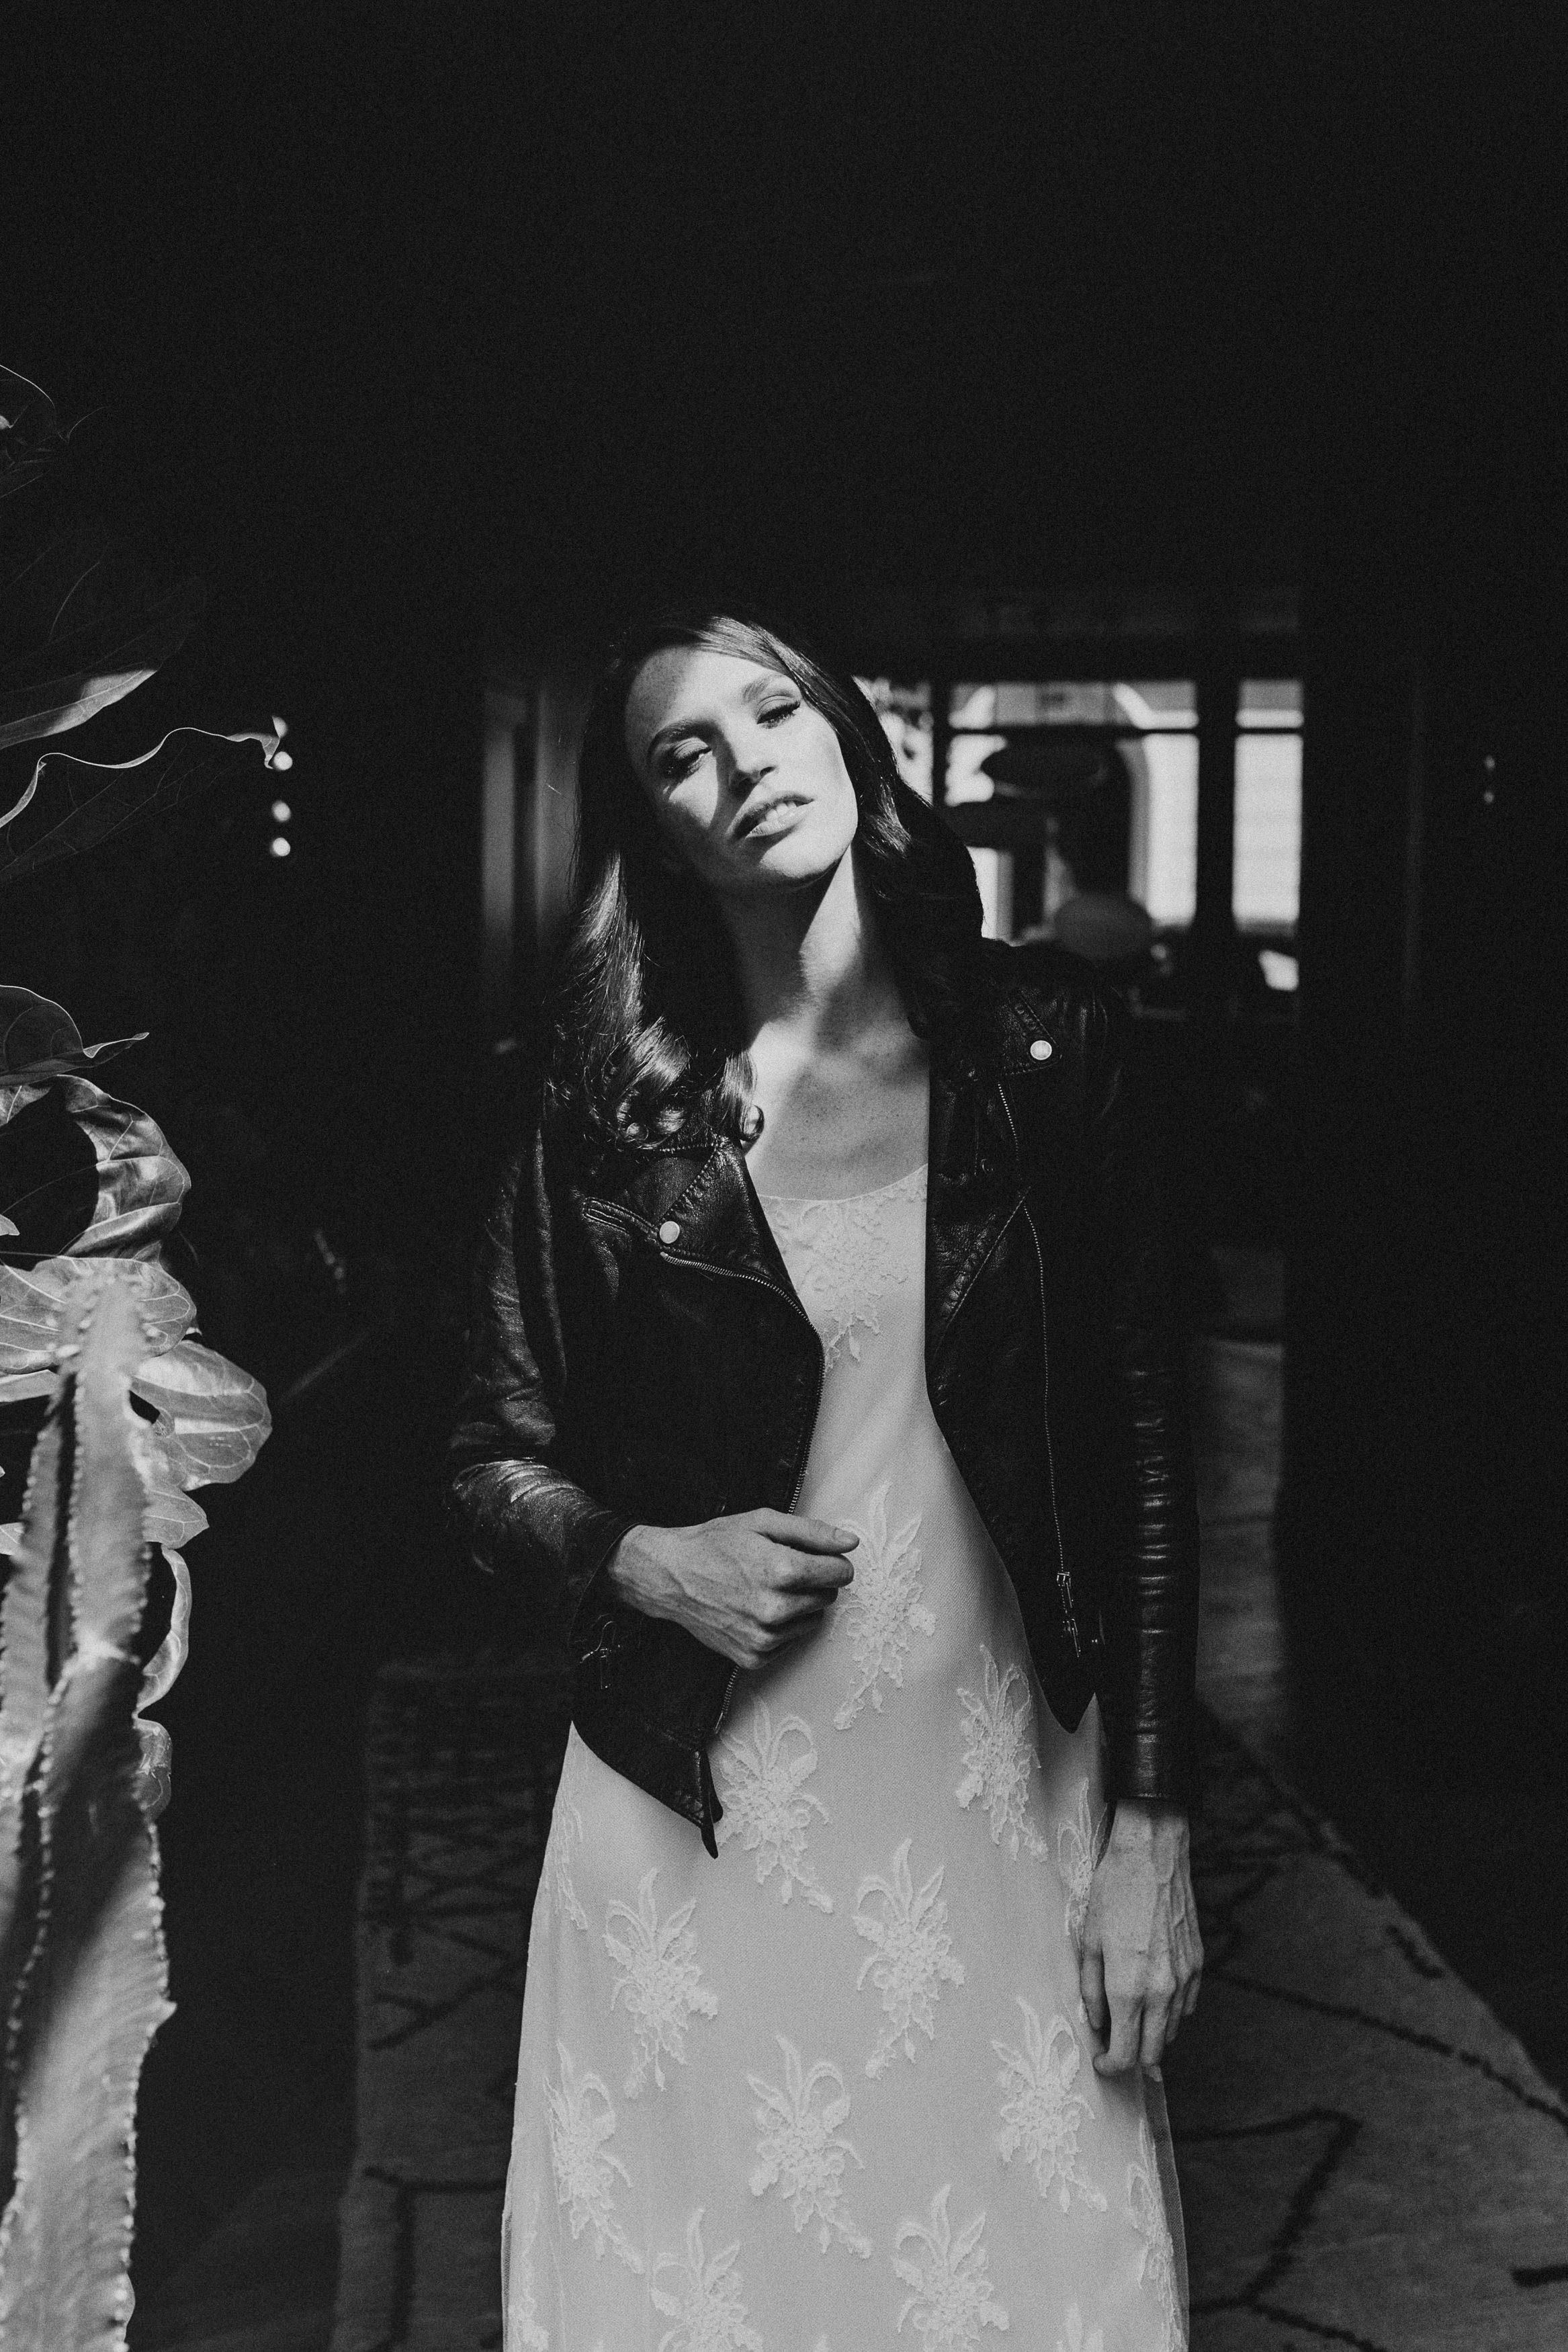 Boheme-Rock-Perfecto-mariage-davidpurves-37